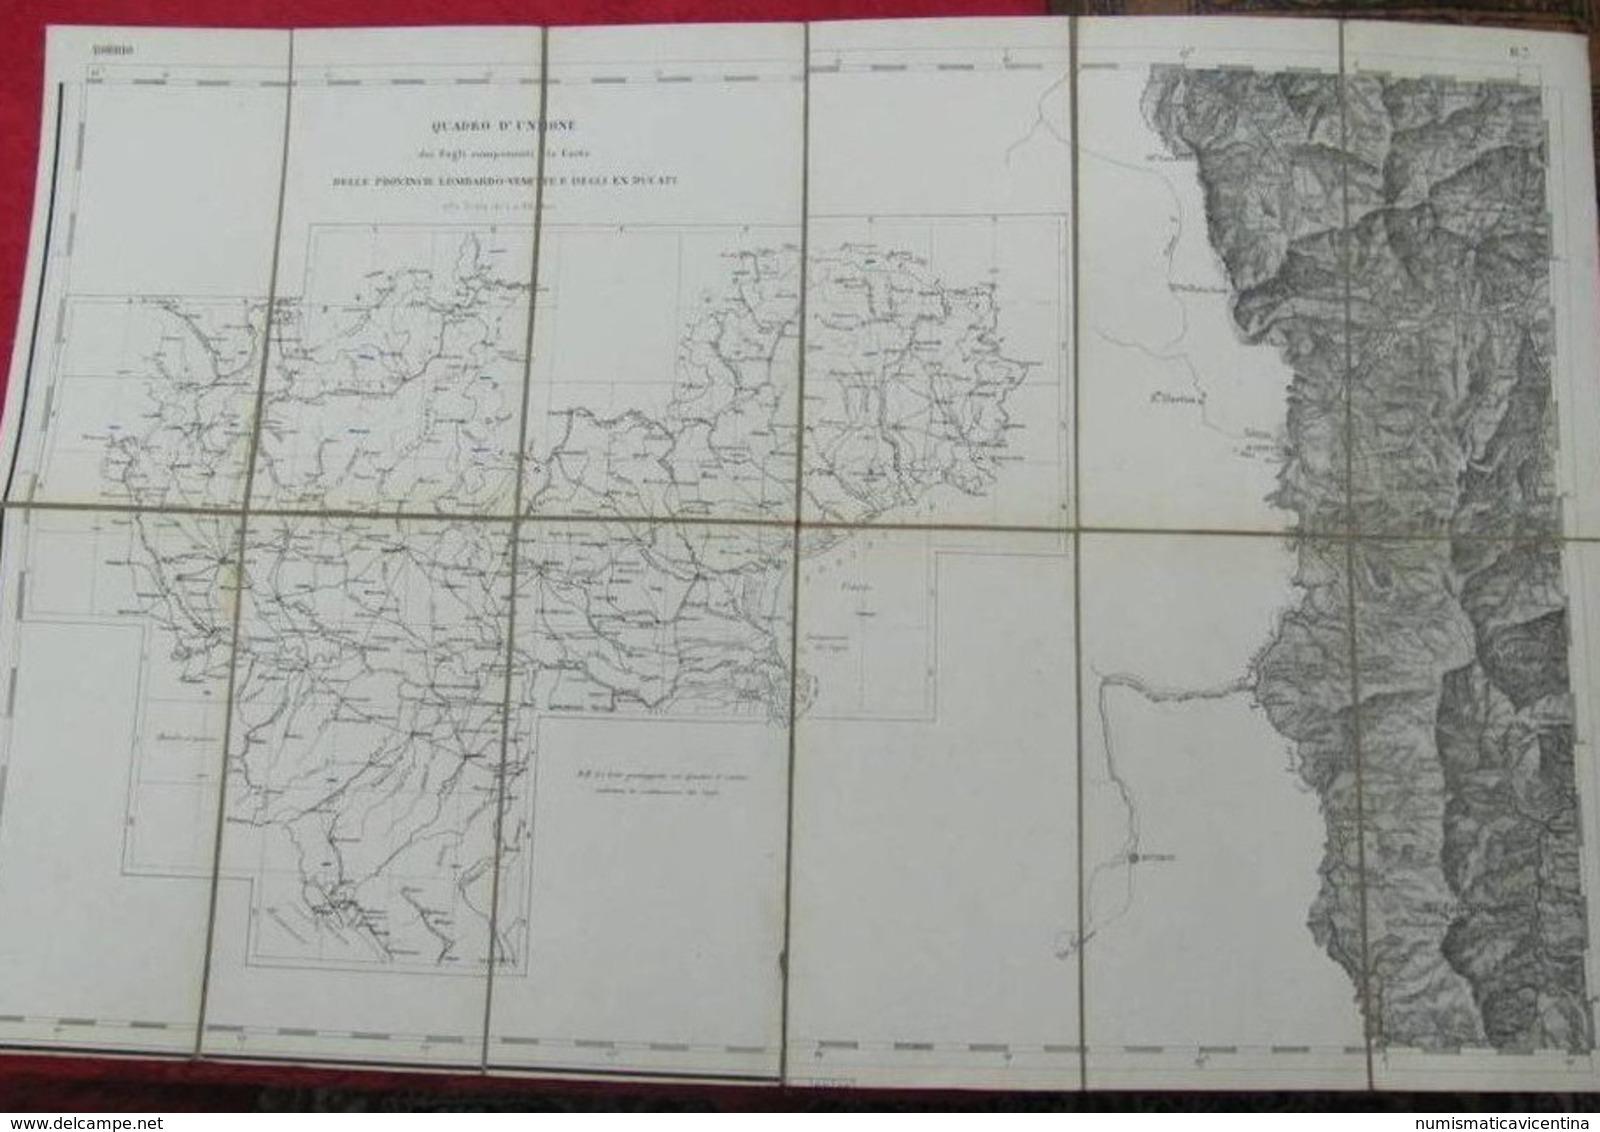 BOBBIO Piacenza Mappa Telata Carta Geografica Fine '800 Cartes Géographiques Geographic Maps - Carte Geographique